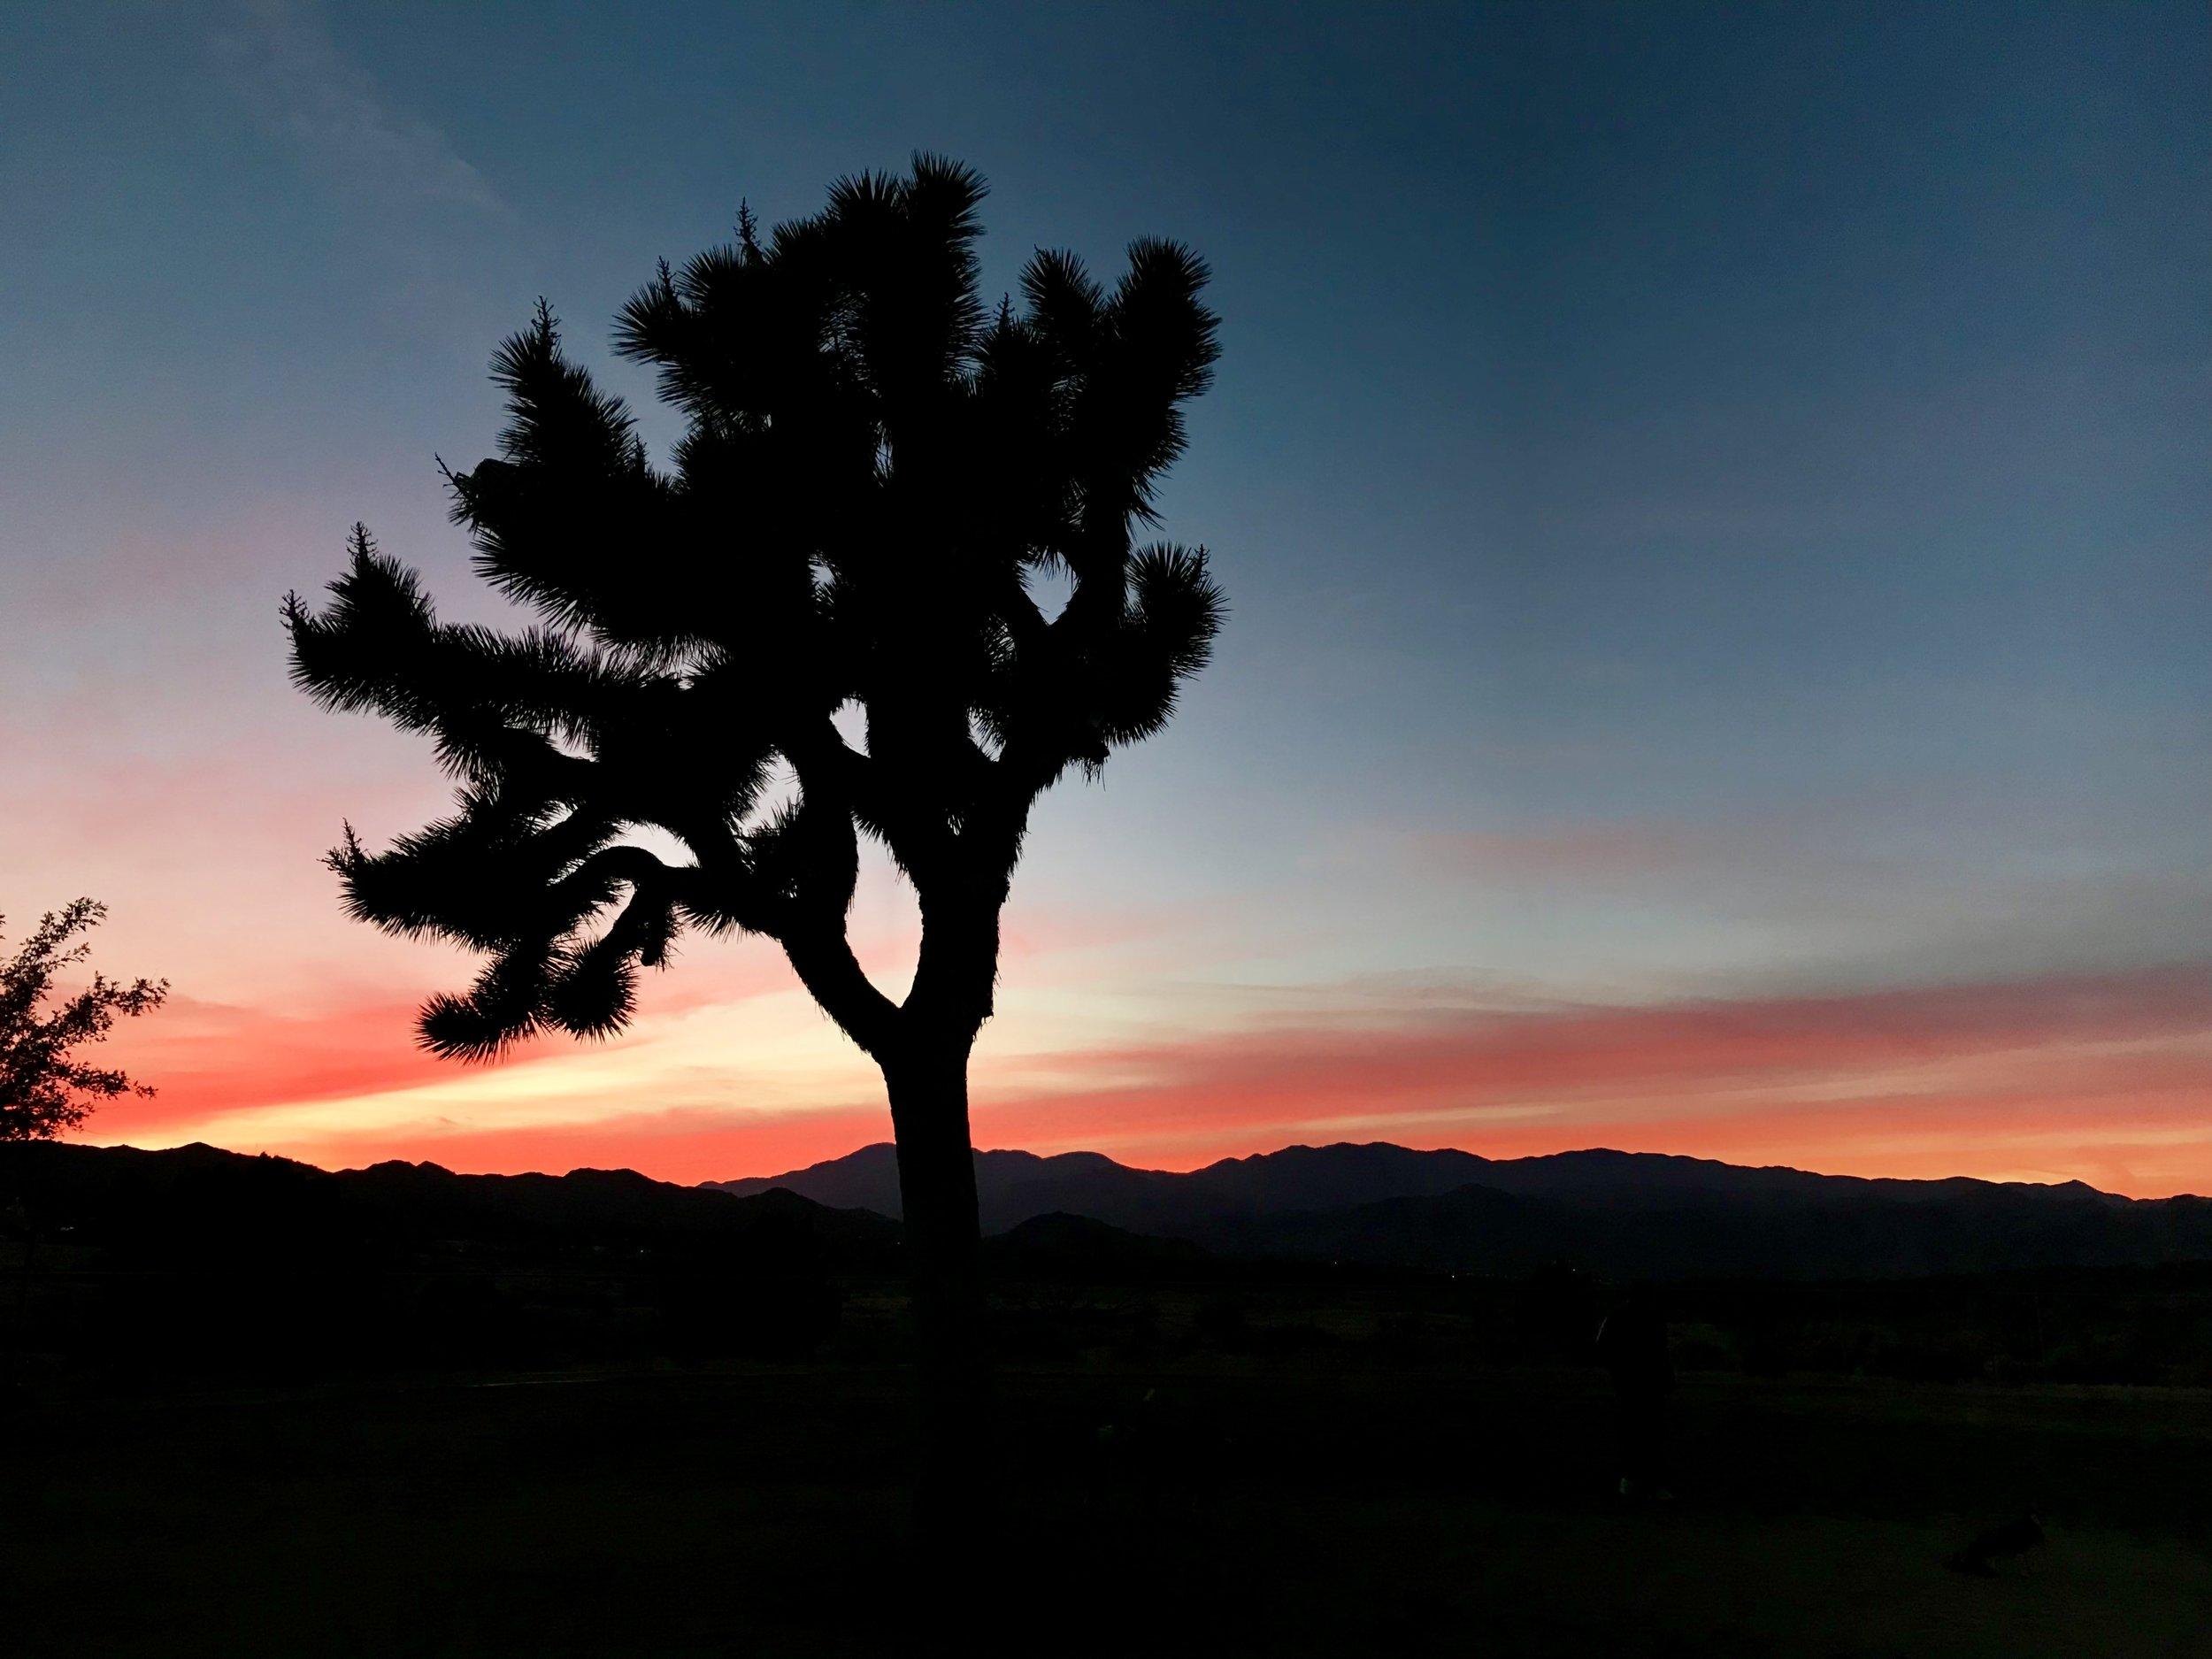 Sunset photo taken the other day by my husband Brad Klopman.